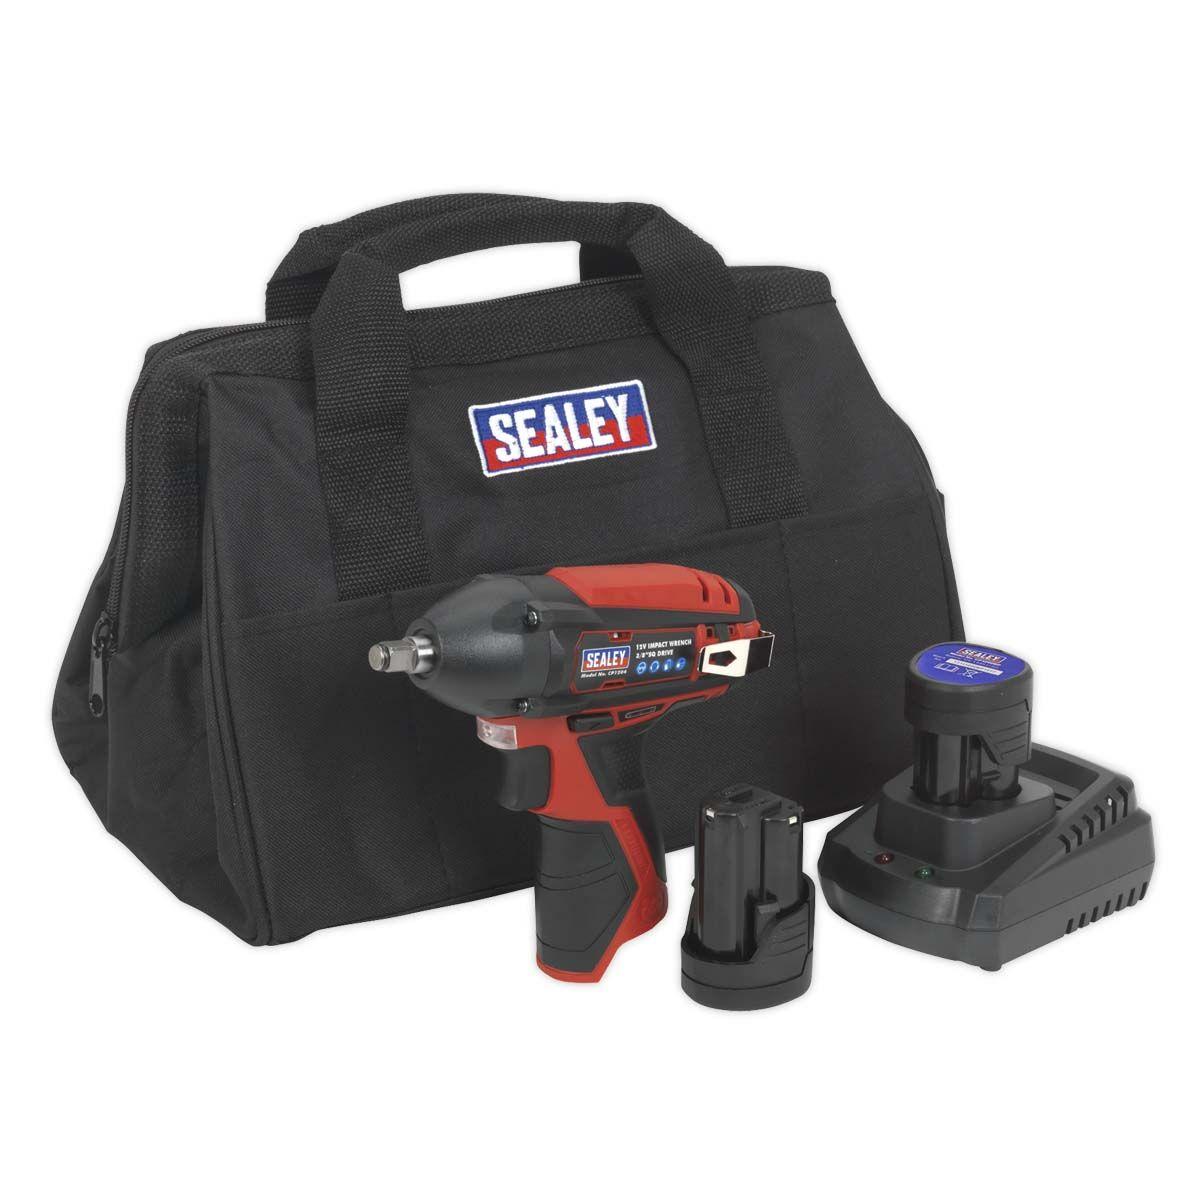 "Sealey Impact Wrench Kit 3/8""Sq Drive 12V Li-ion - 2 Batteries"